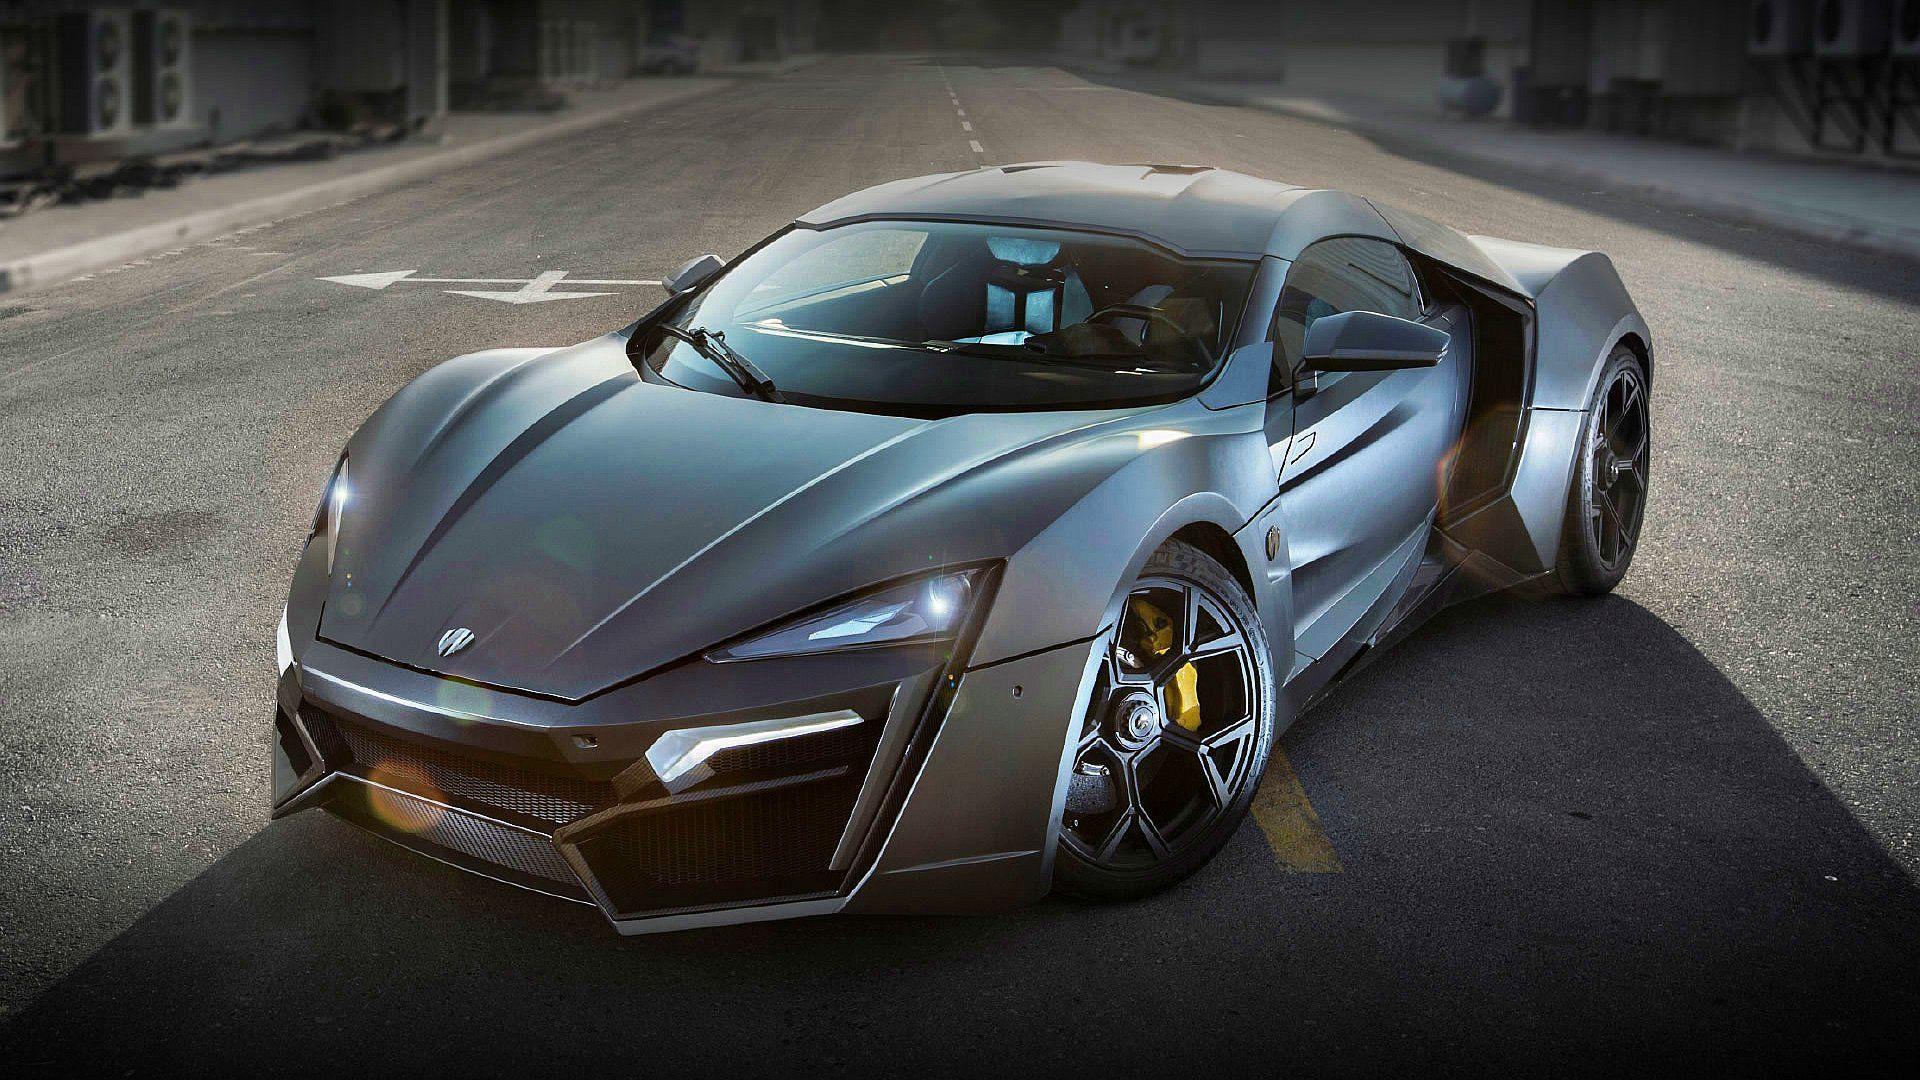 Lykan Hypersport Wallpaper Hd Wallpapers 1080p Luxury Sports Cars Coches Caros Auto De Lujo